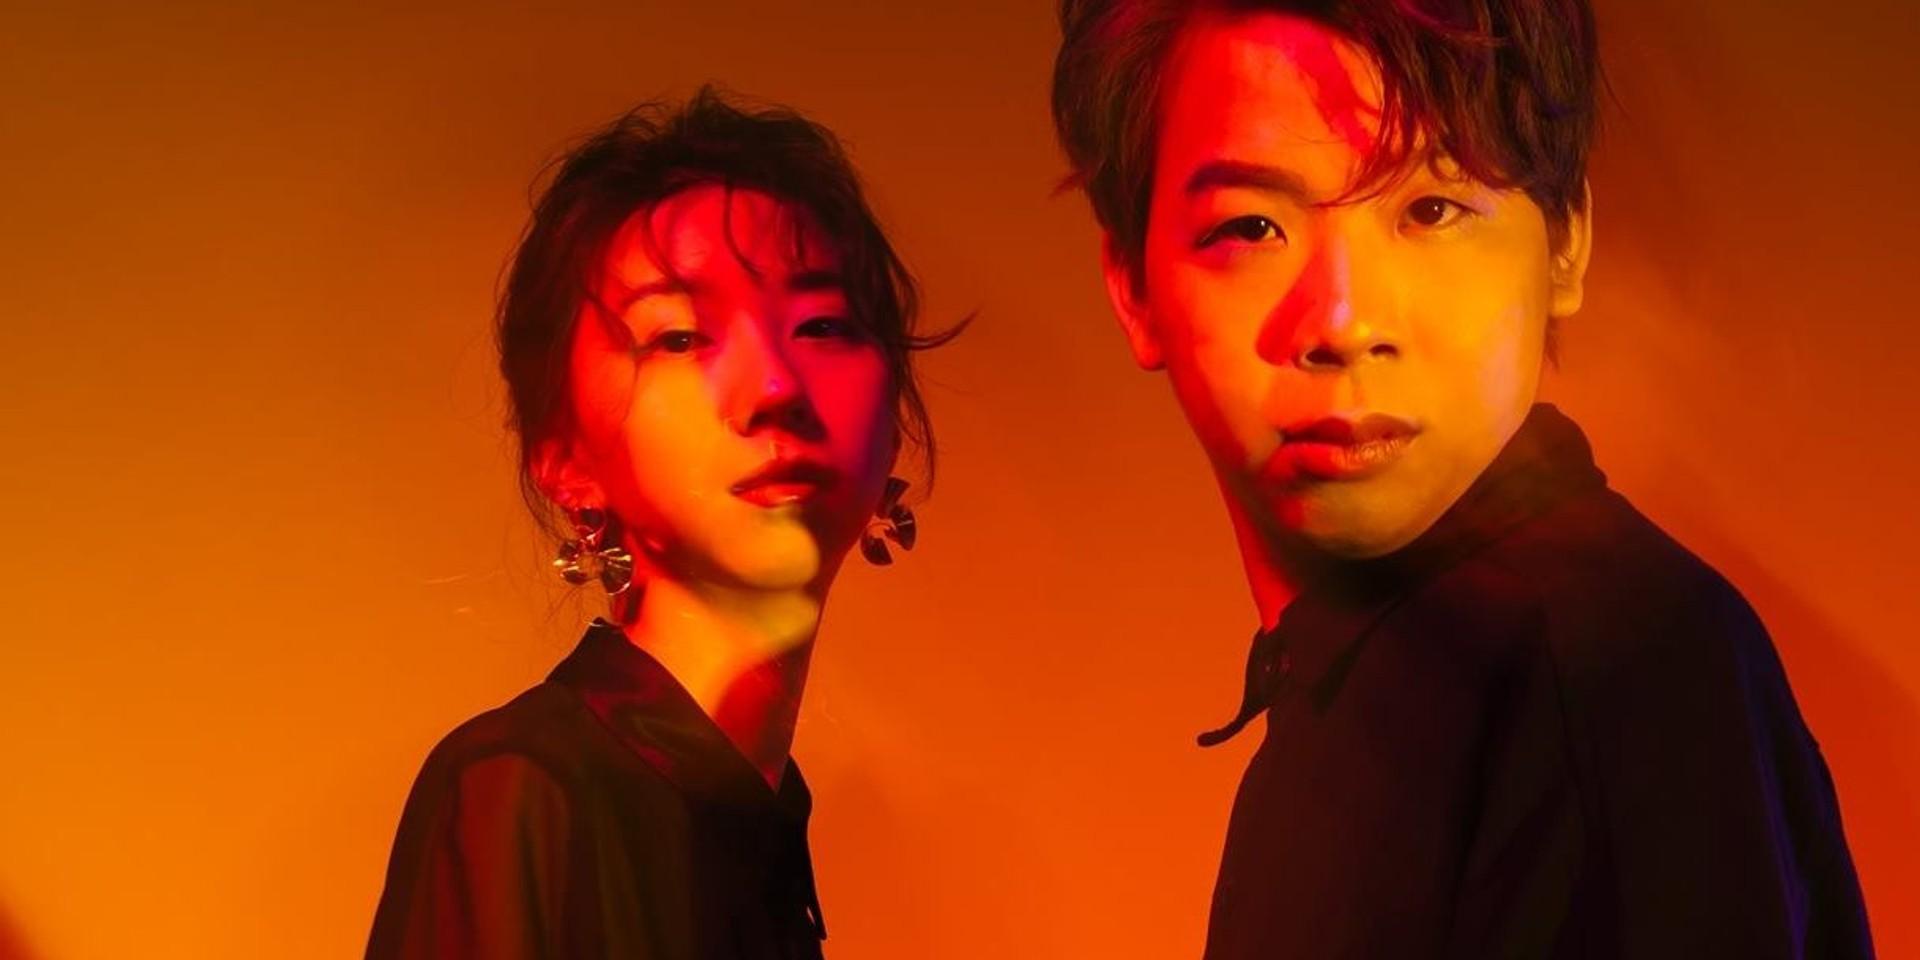 Asia Spotlight: Taiwan's 好樂團 Goodband on turning struggles into surprises